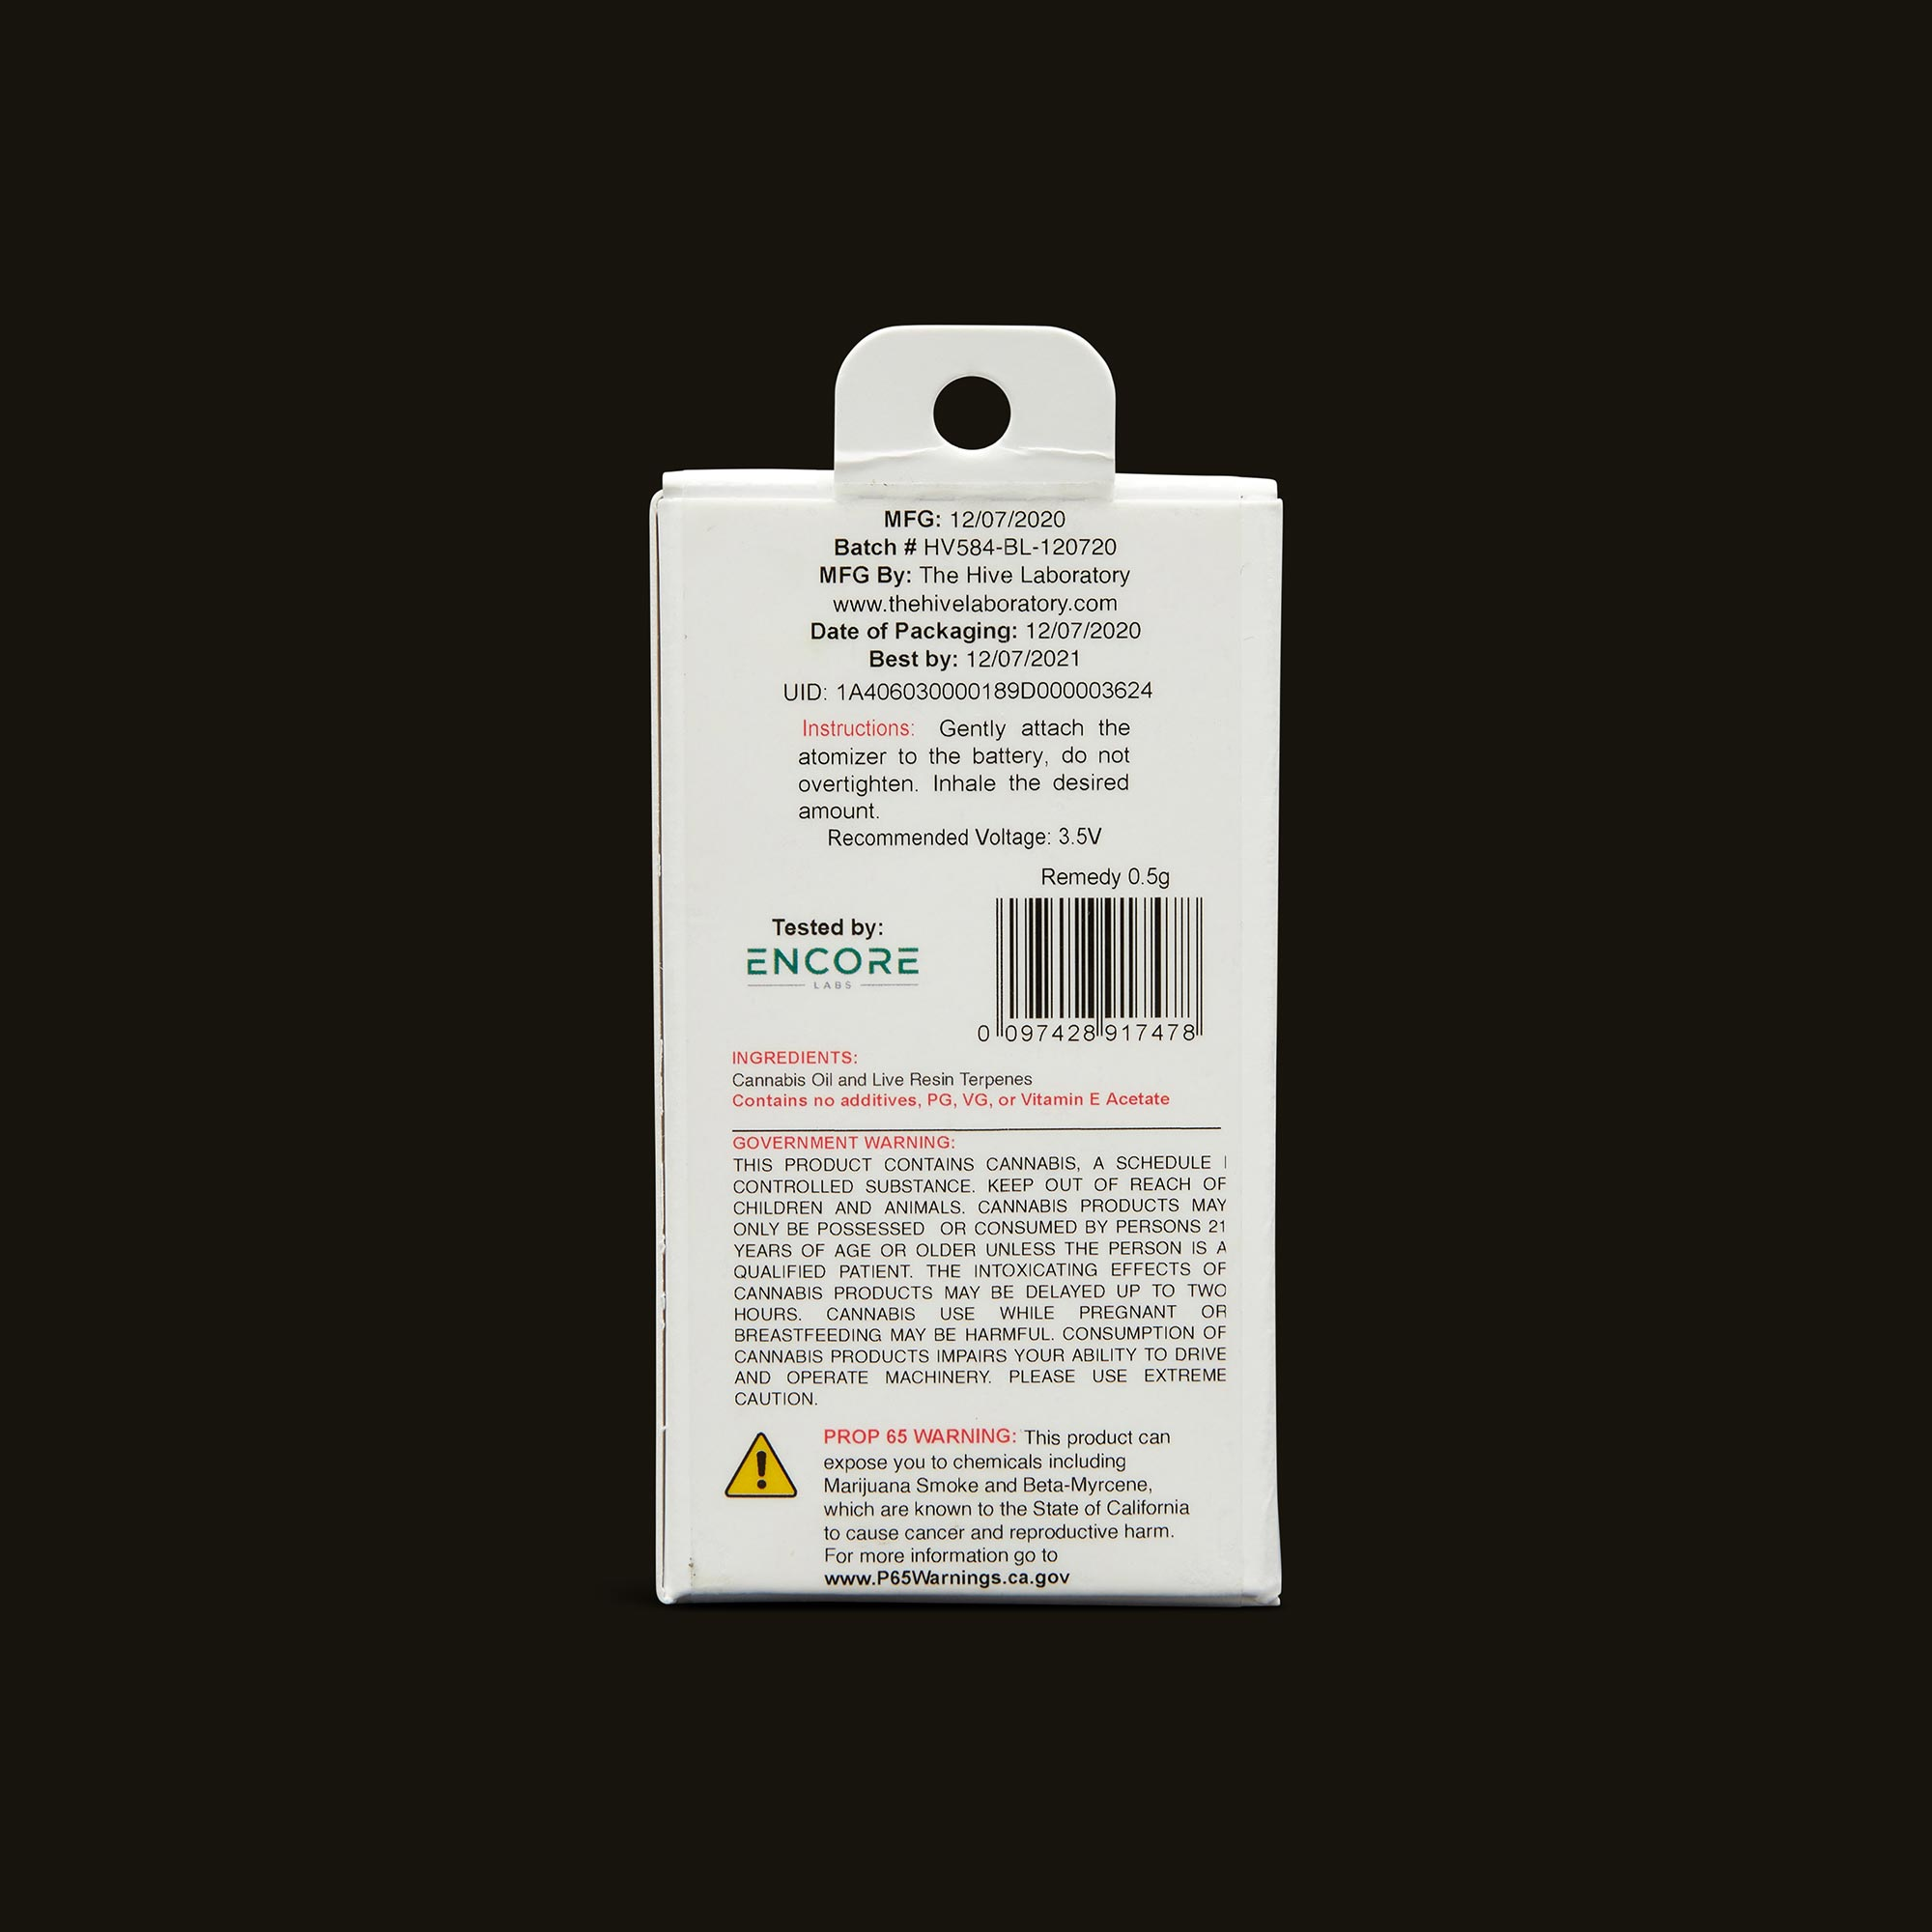 Bloom Brands Vape Pen - Remedy 2:1 Live Resin Cartridge - 1g